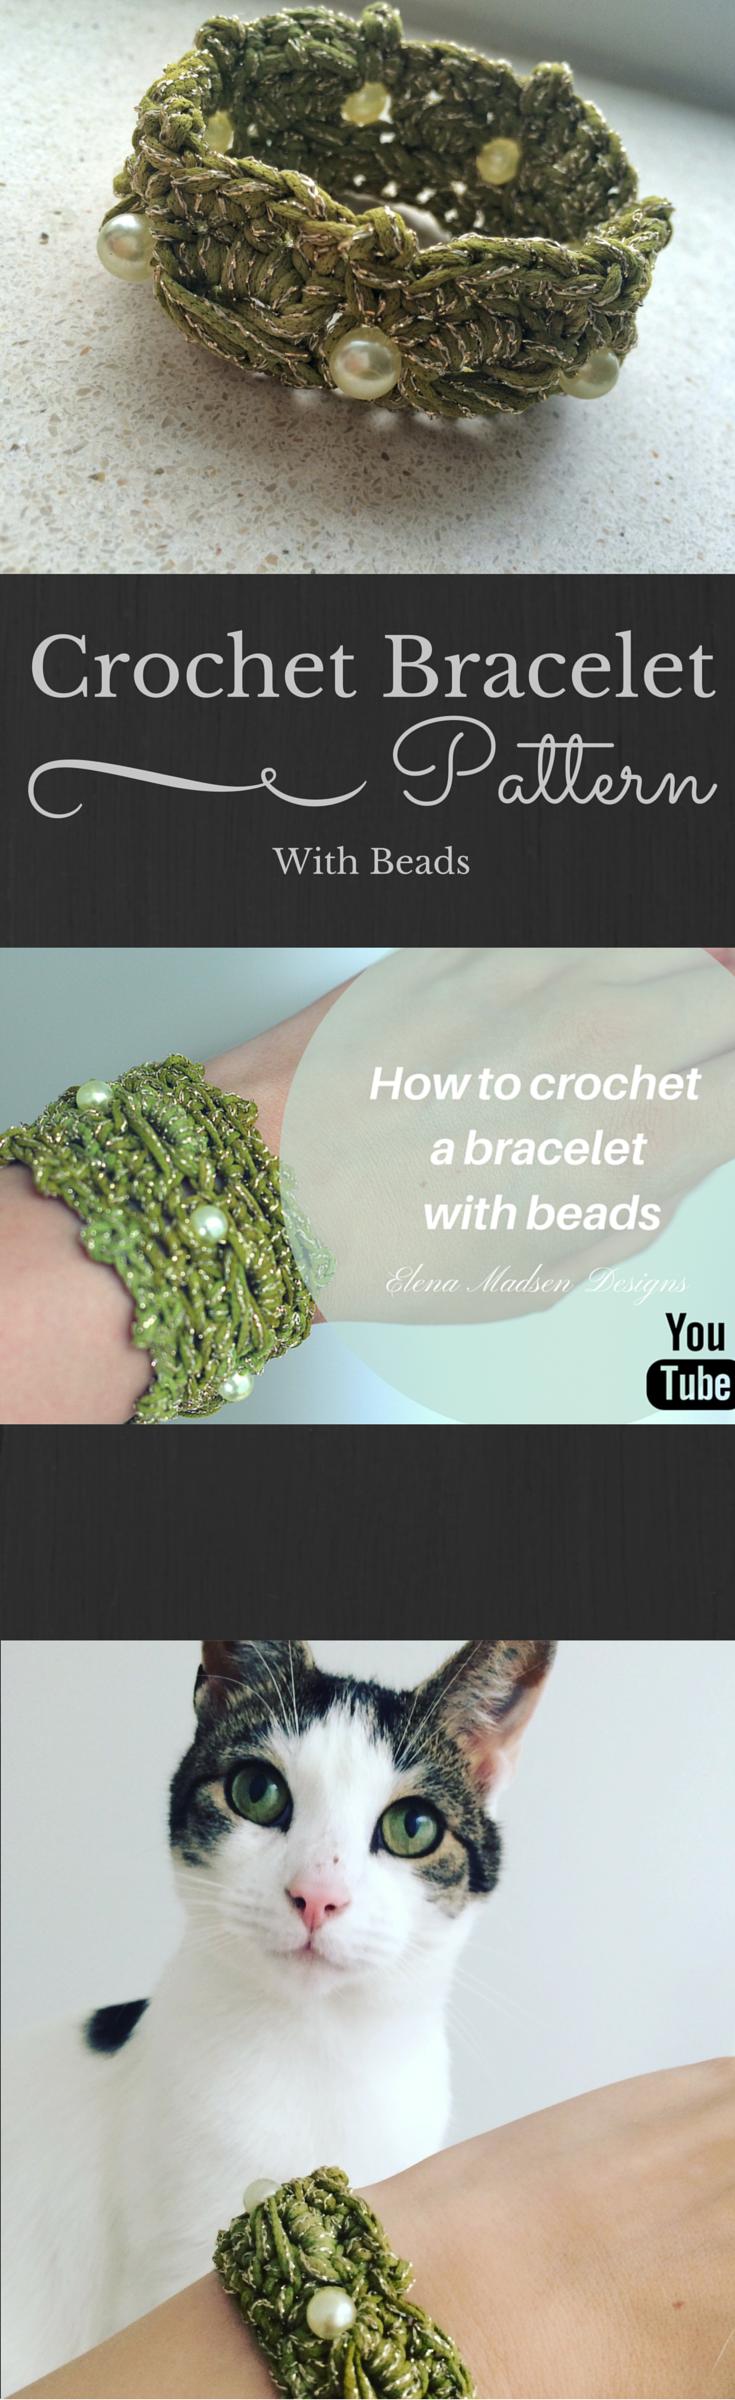 Free Crochet Bracelet Tutorial On Youtube Follow This Crochet